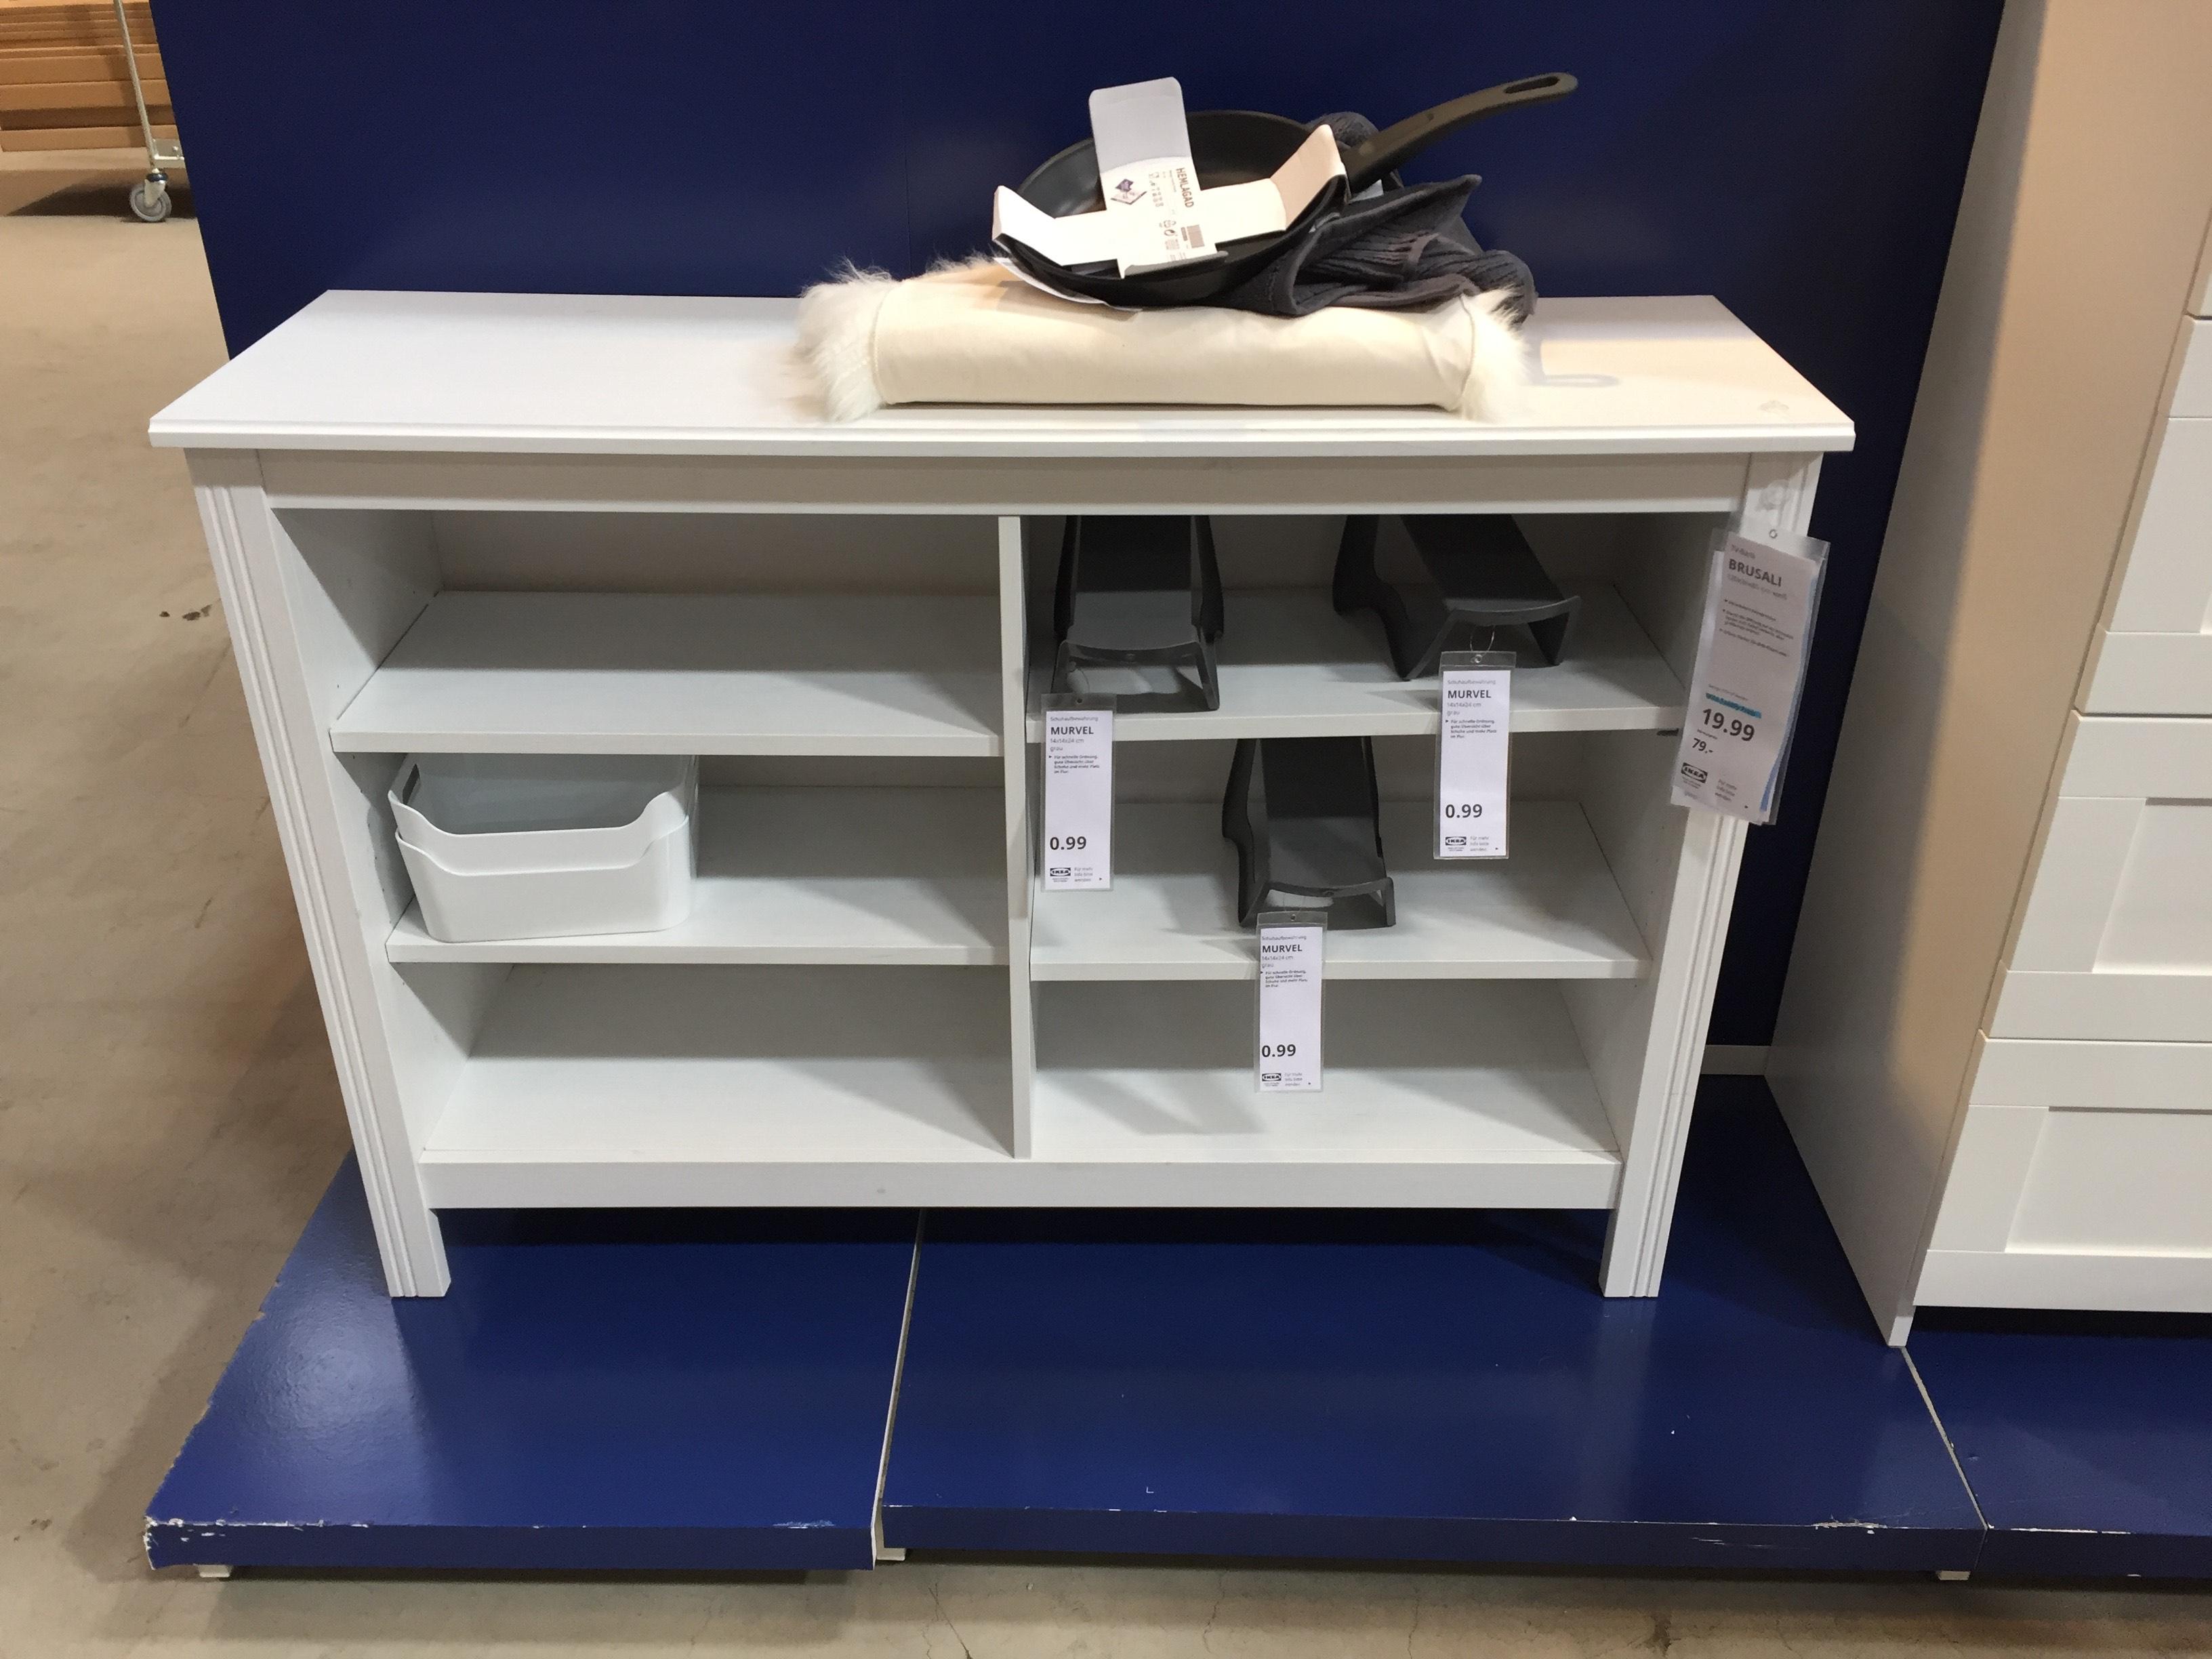 (Lokal Ikea Köln Butzweilerhof) Ikea family TV-Bank brusali